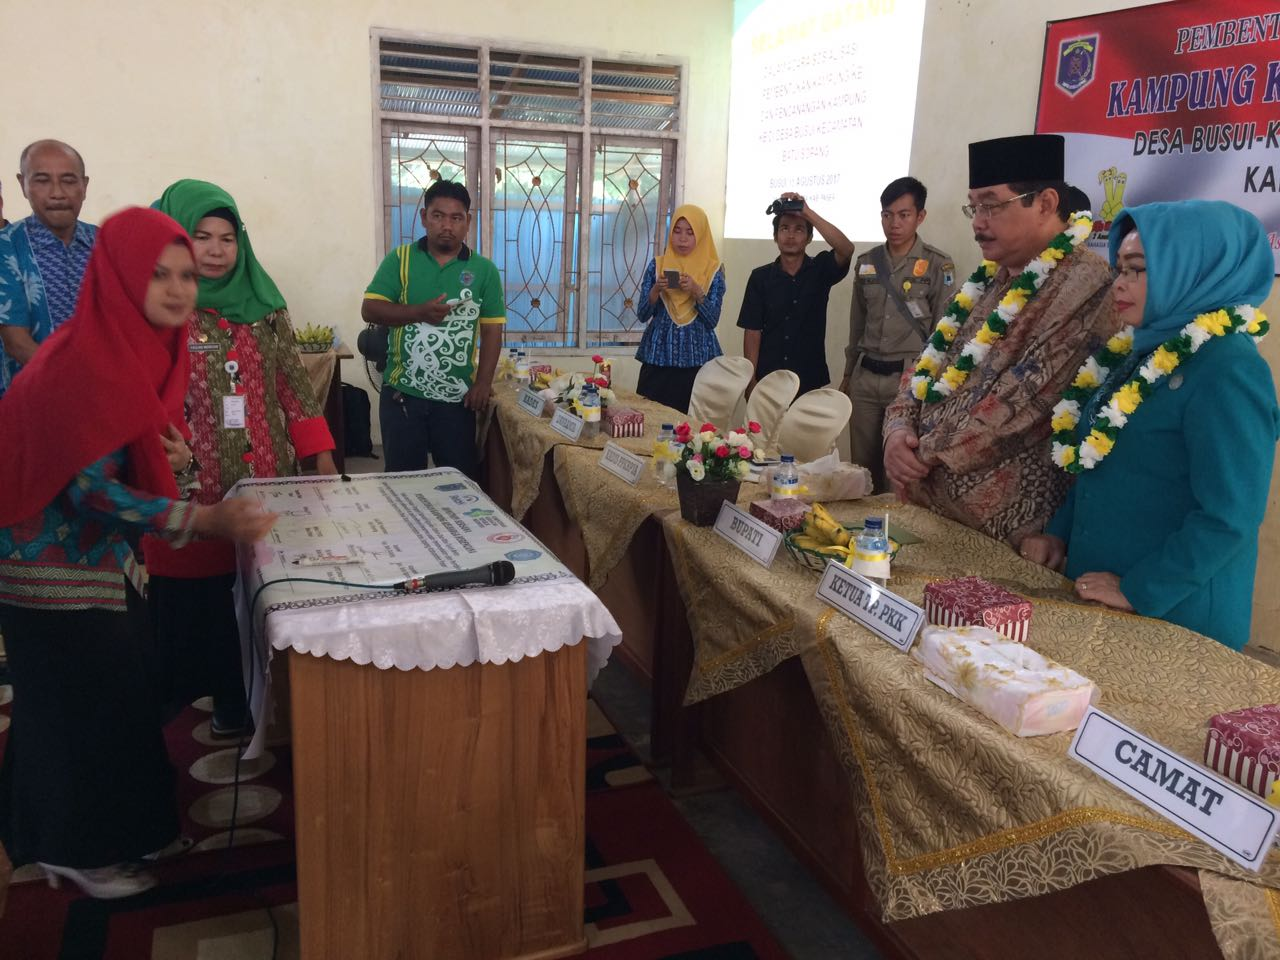 Bungo Teratai Nama Kampung KB di Desa Busui